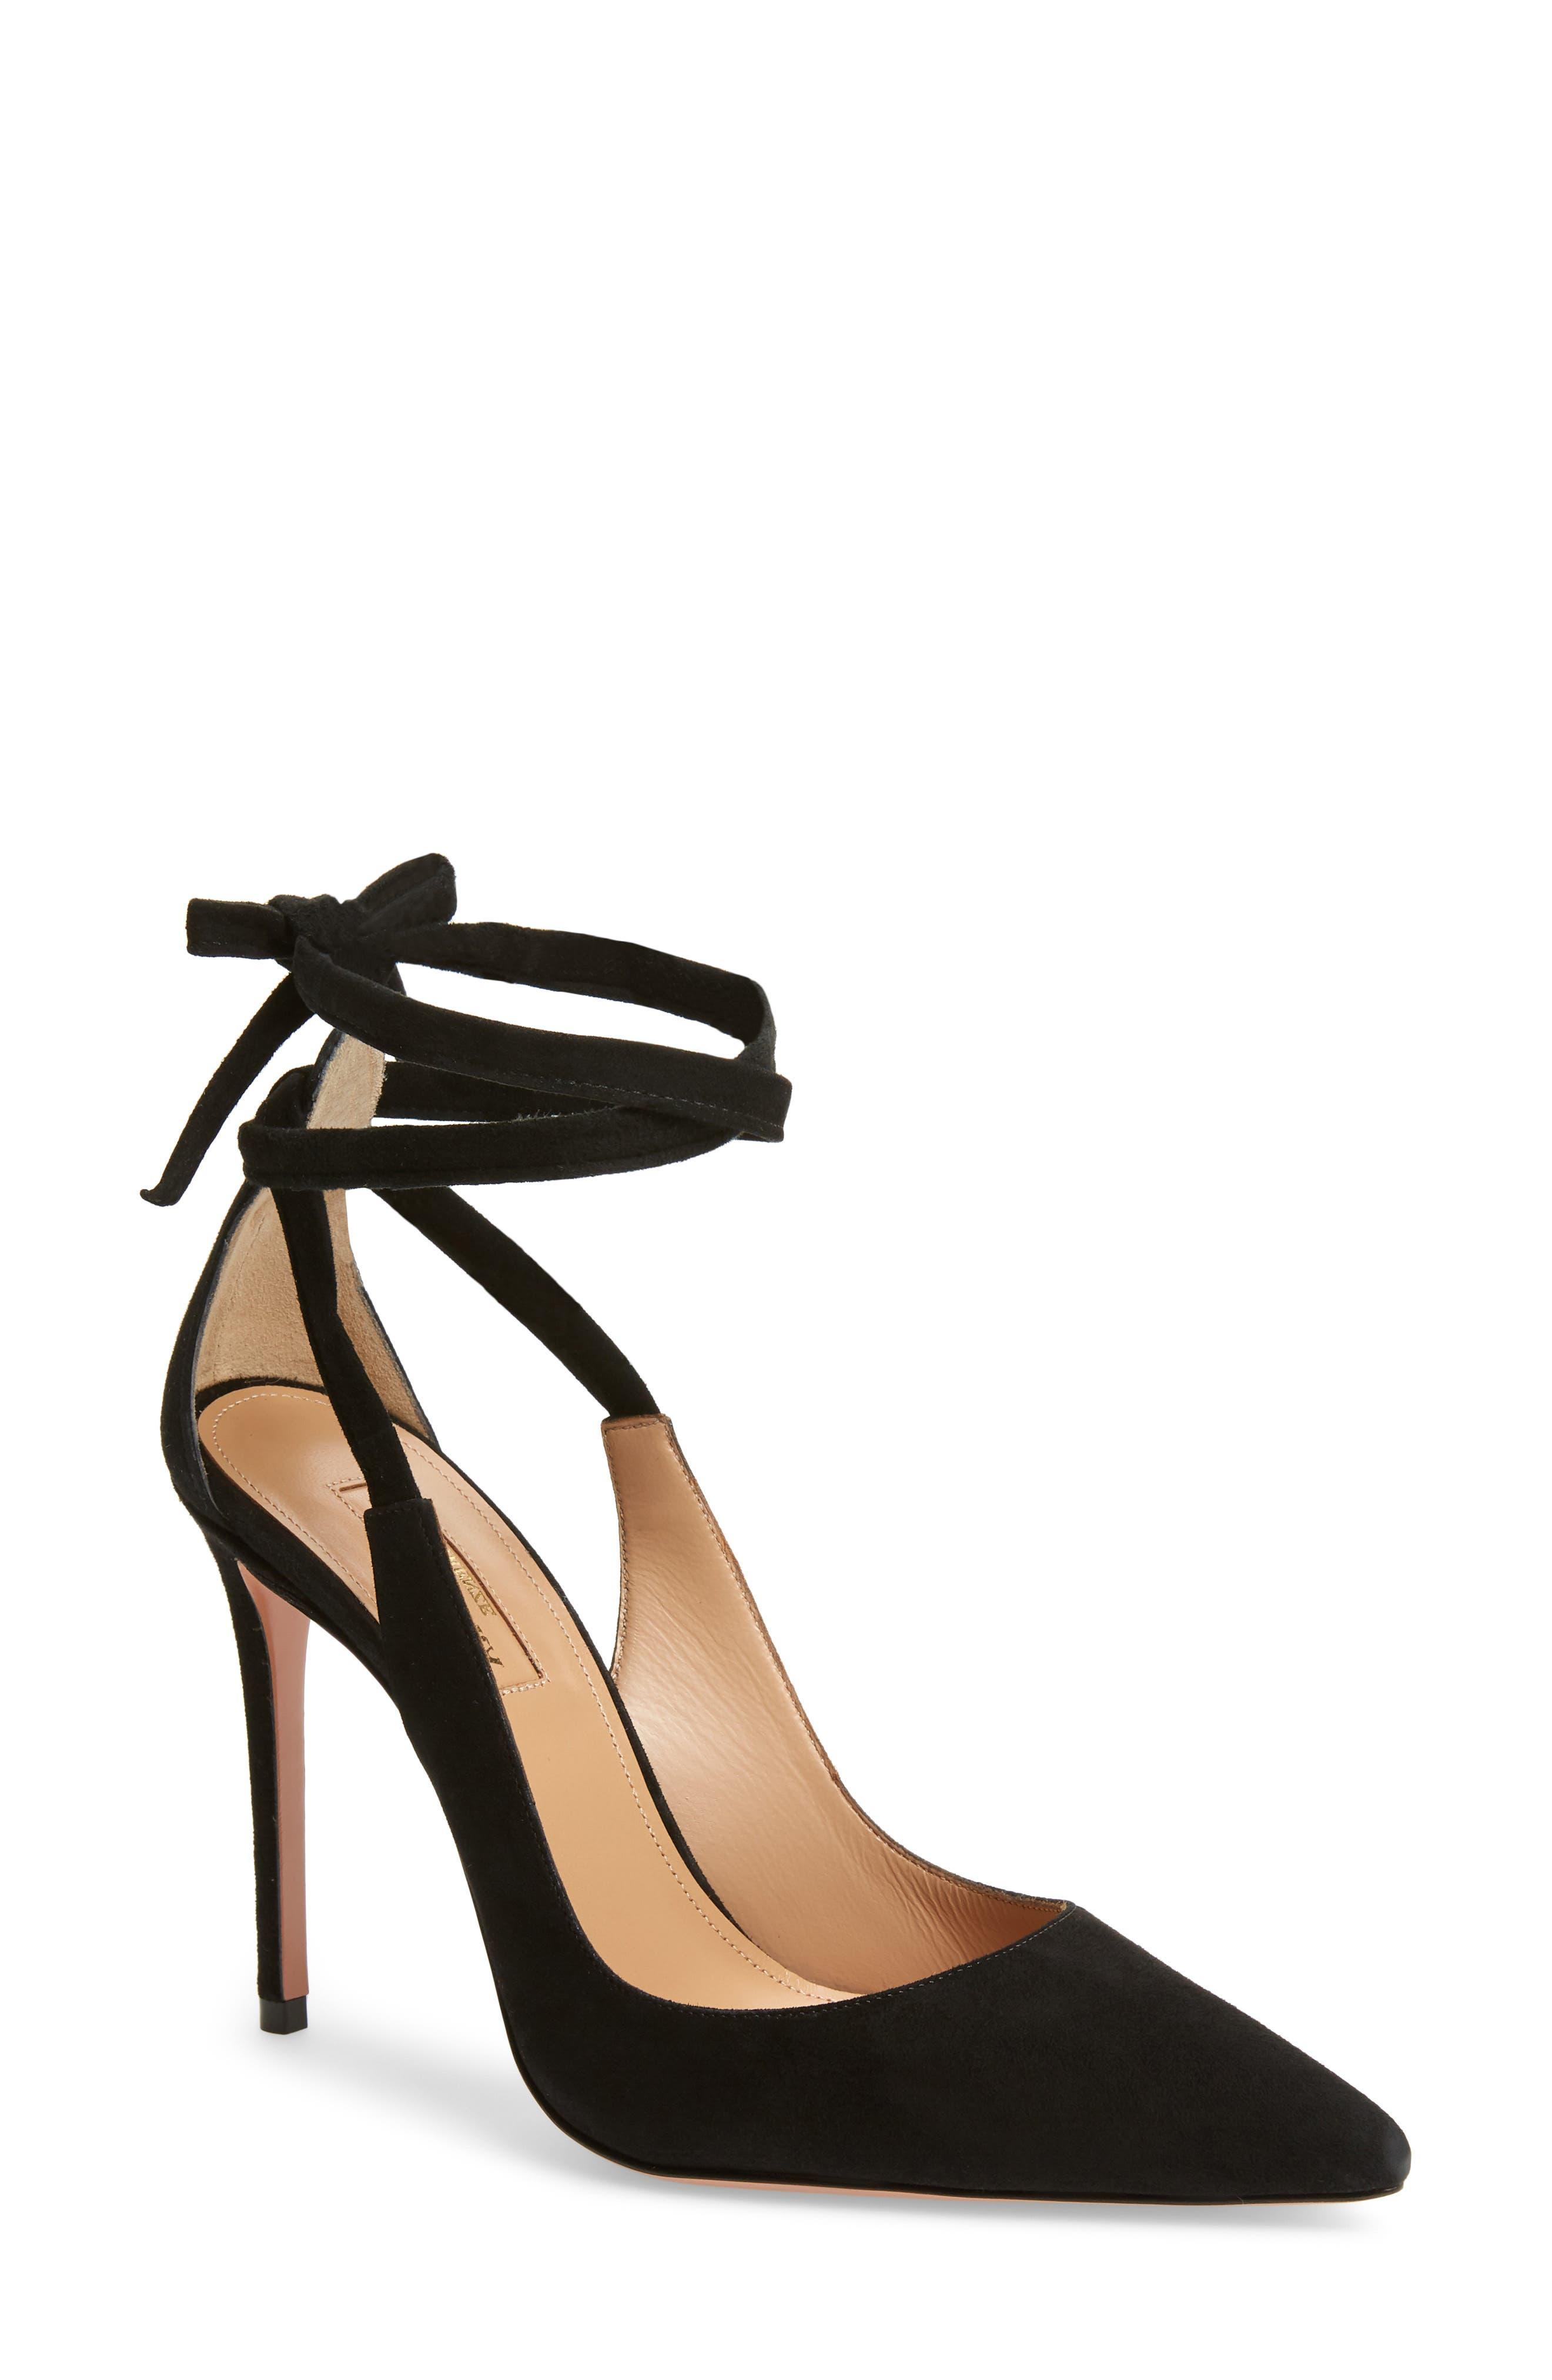 Milano Ankle Tie Pump,                             Main thumbnail 1, color,                             BLACK